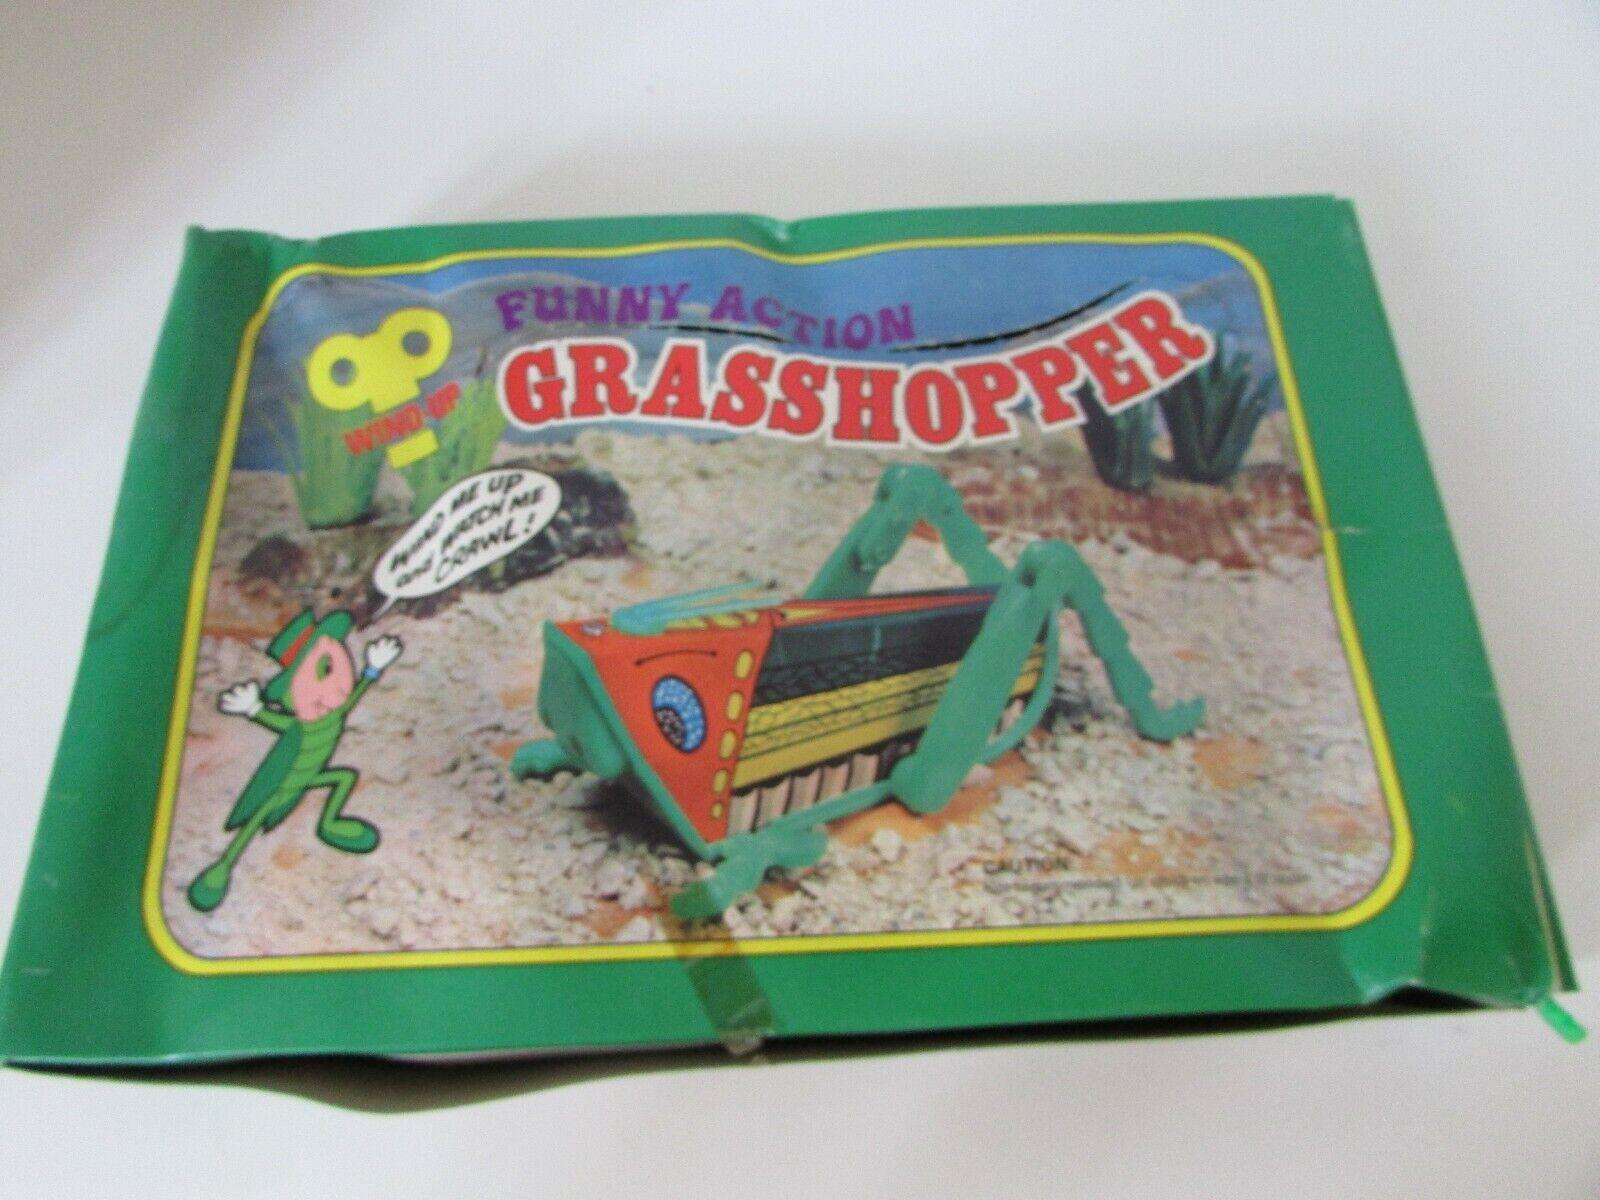 12 windup novelty toys crawling grasshoppers 4